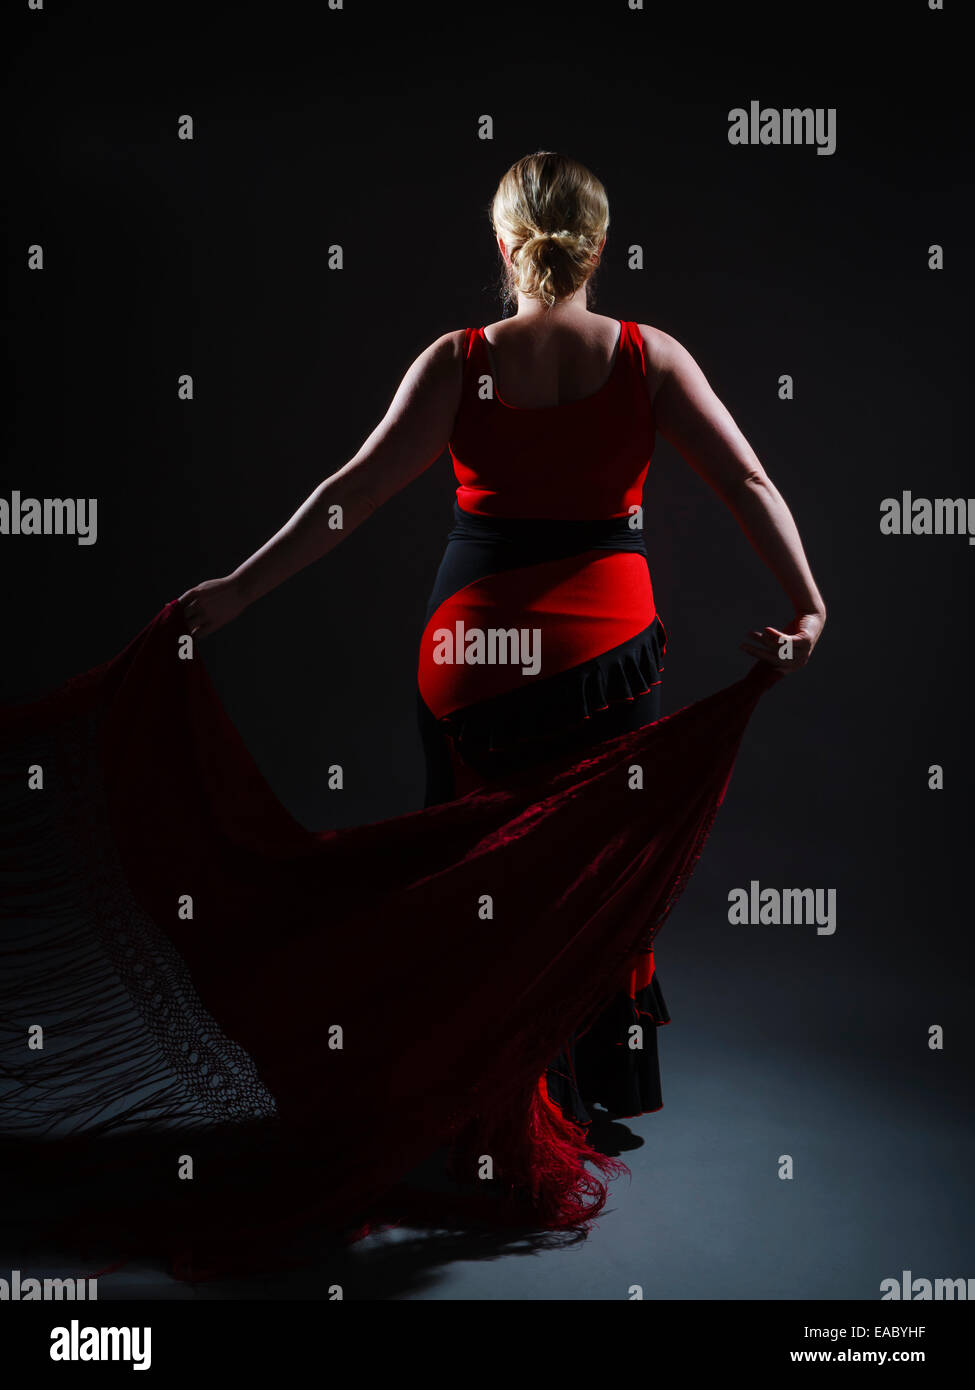 Flamenco - Stock Image